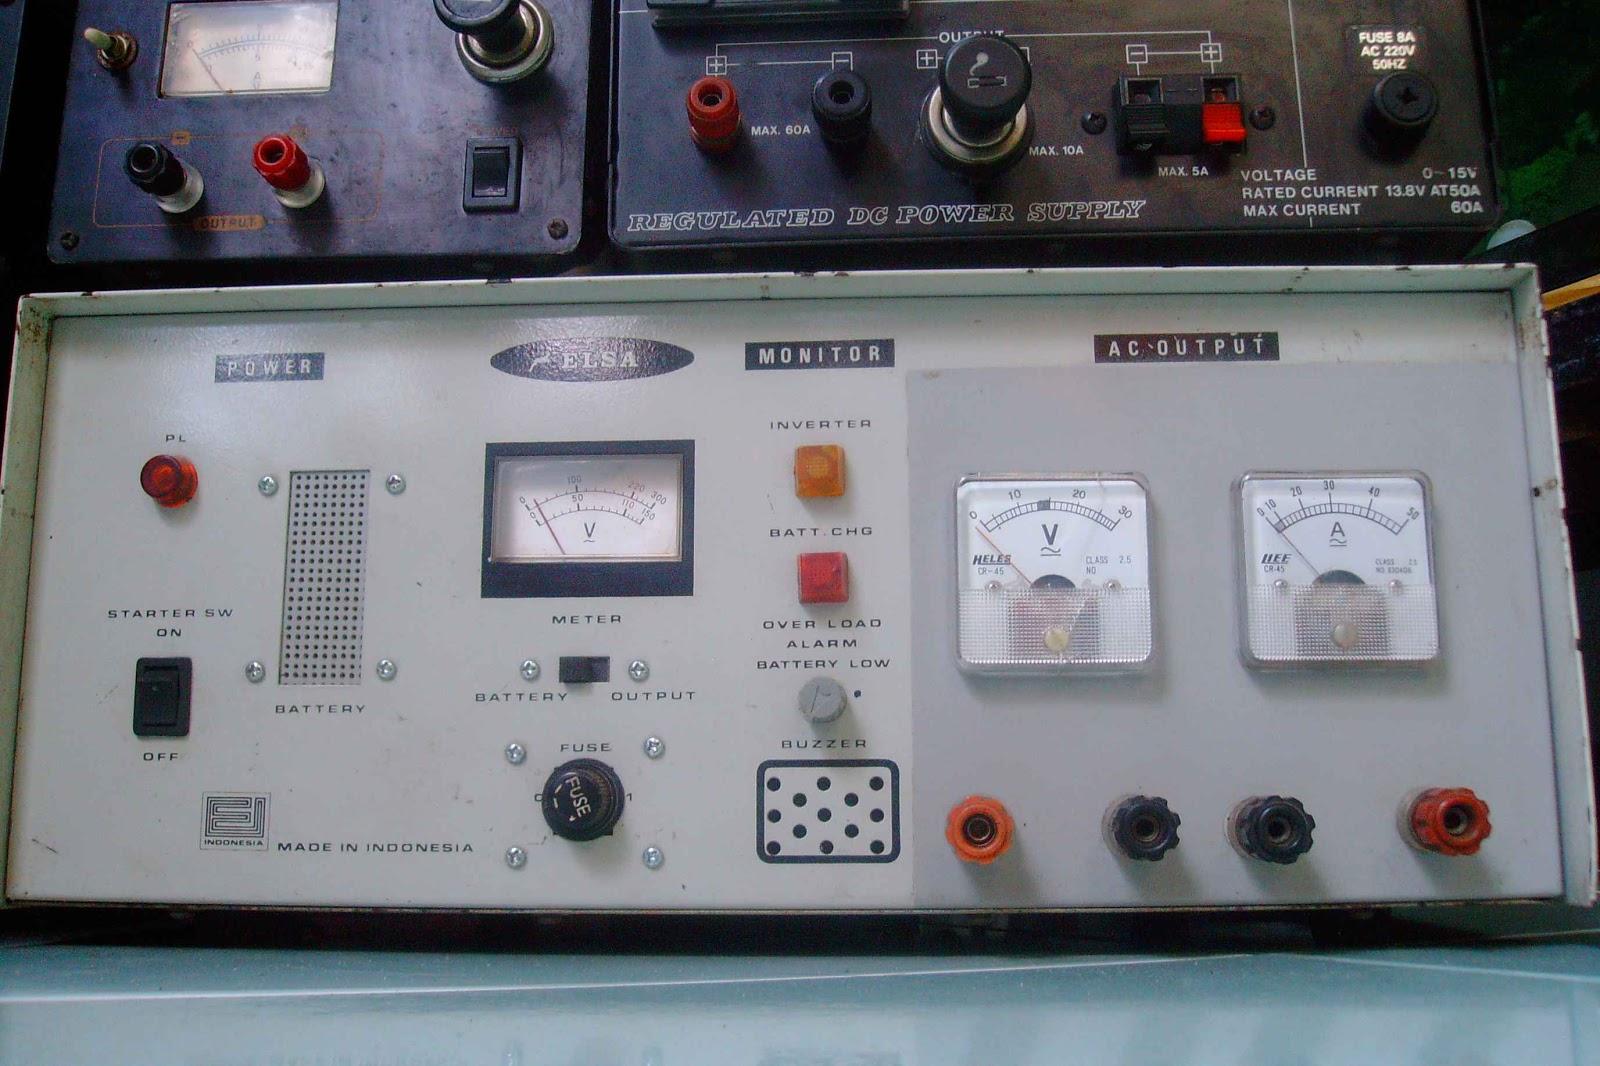 elektronik kbh